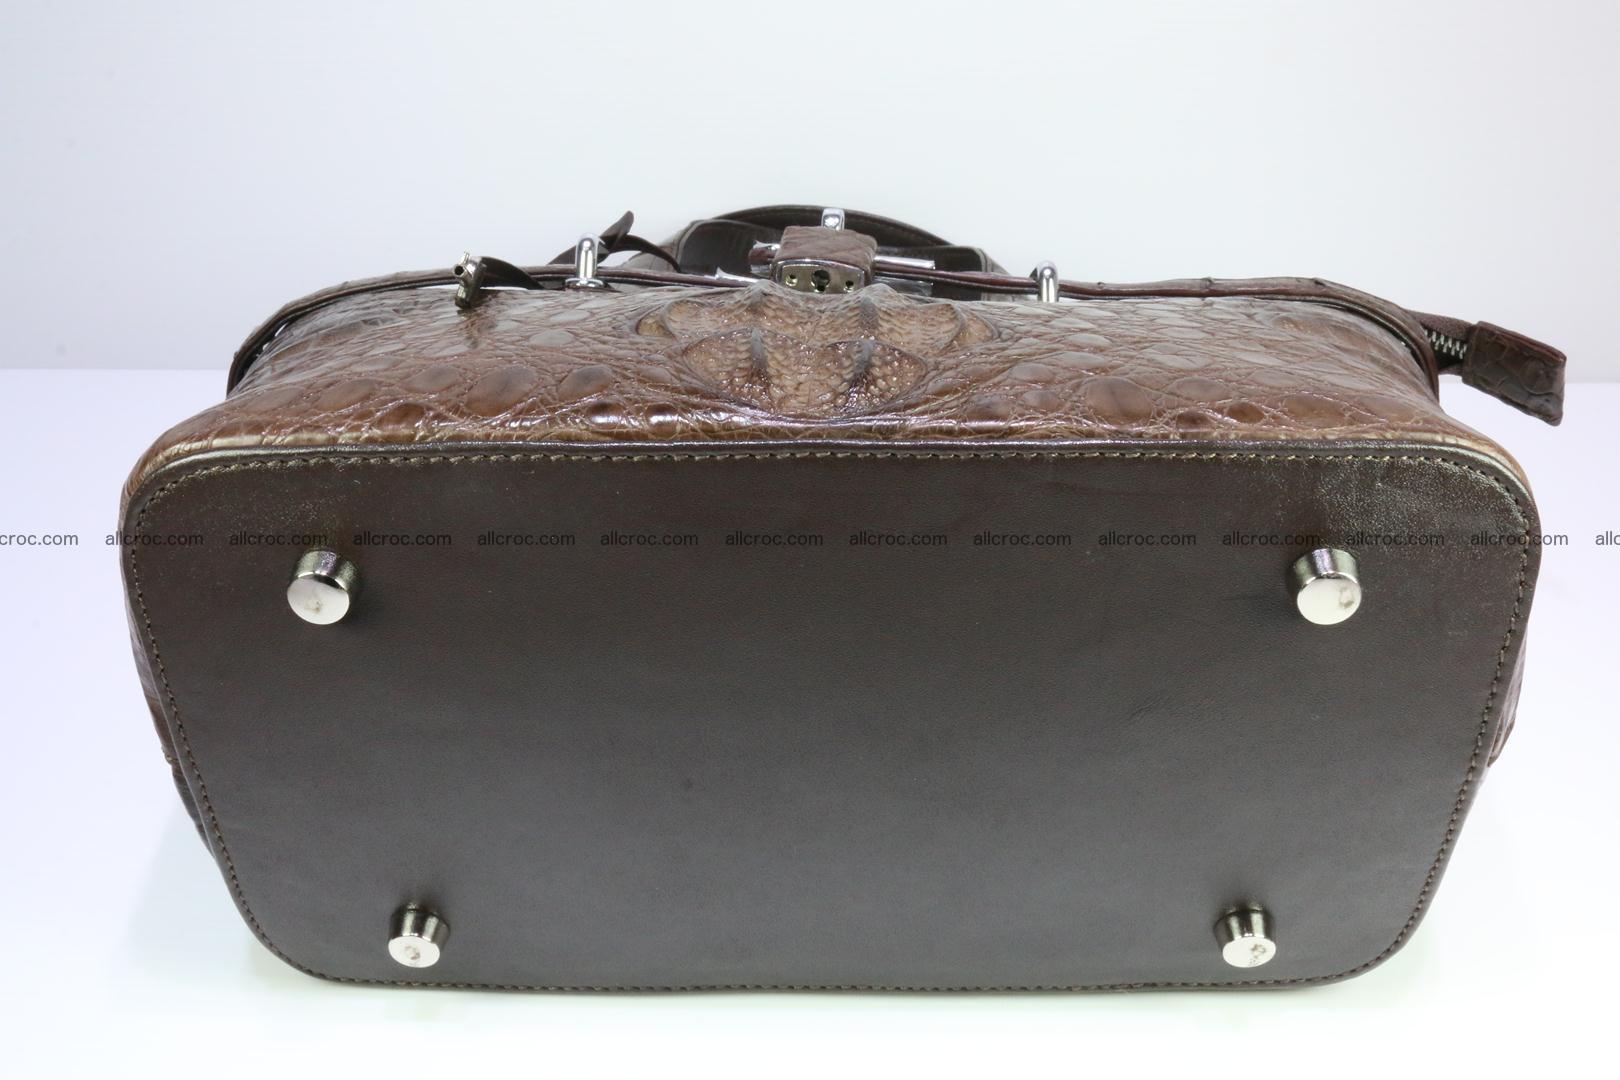 Genuine crocodile handbag for ladies 050 Foto 10